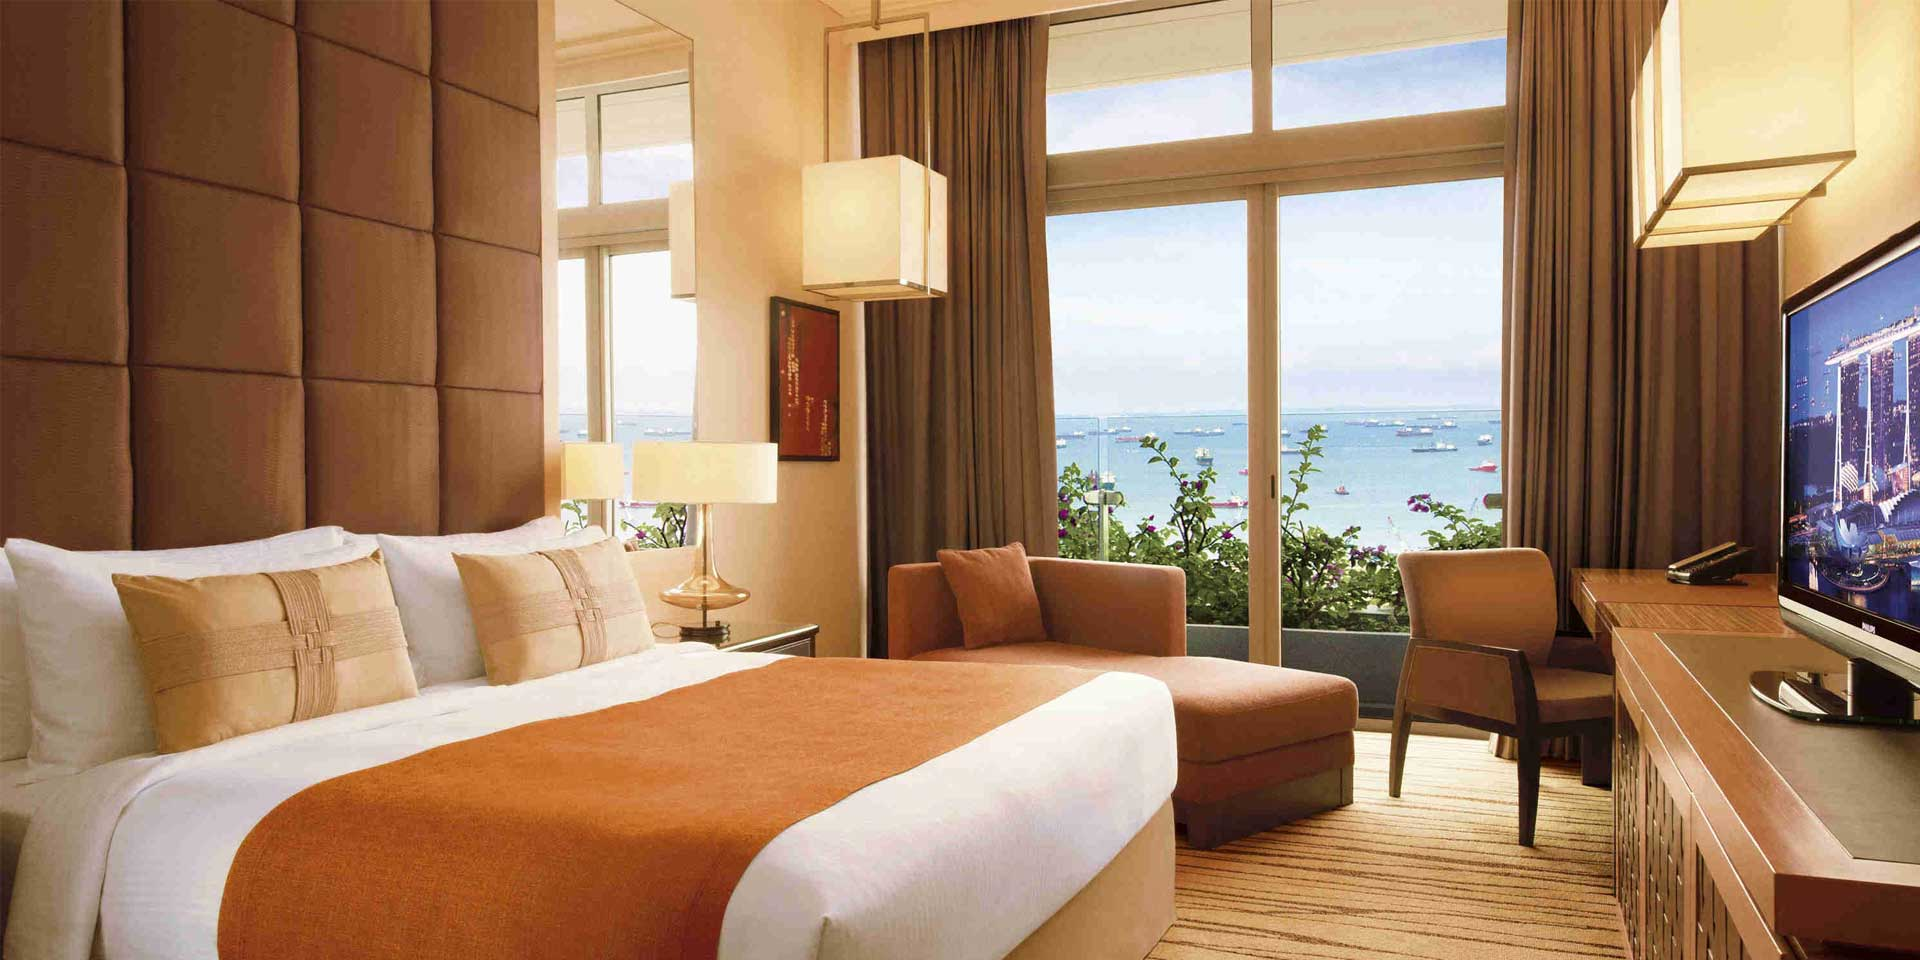 2 Bedroom Suites San Diego Deluxe Room In Marina Bay Sands Singapore Hotel